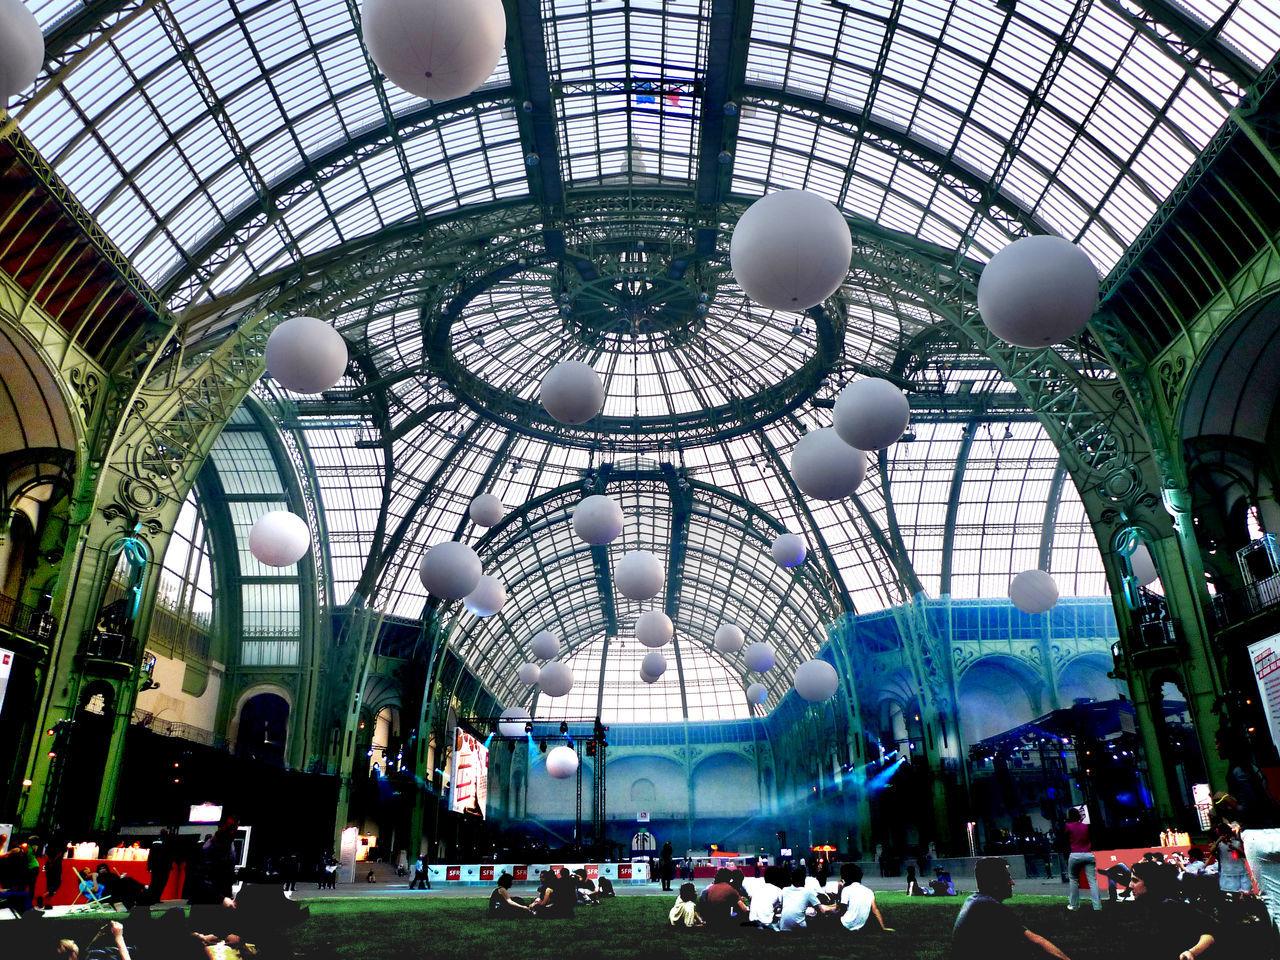 Architecture Architecture Built Structure Ceiling Dome Grand Palais Paris Monumental Buildings The Architect - 2017 EyeEm Awards The Photojournalist - 2017 EyeEm Awards Travel Destinations